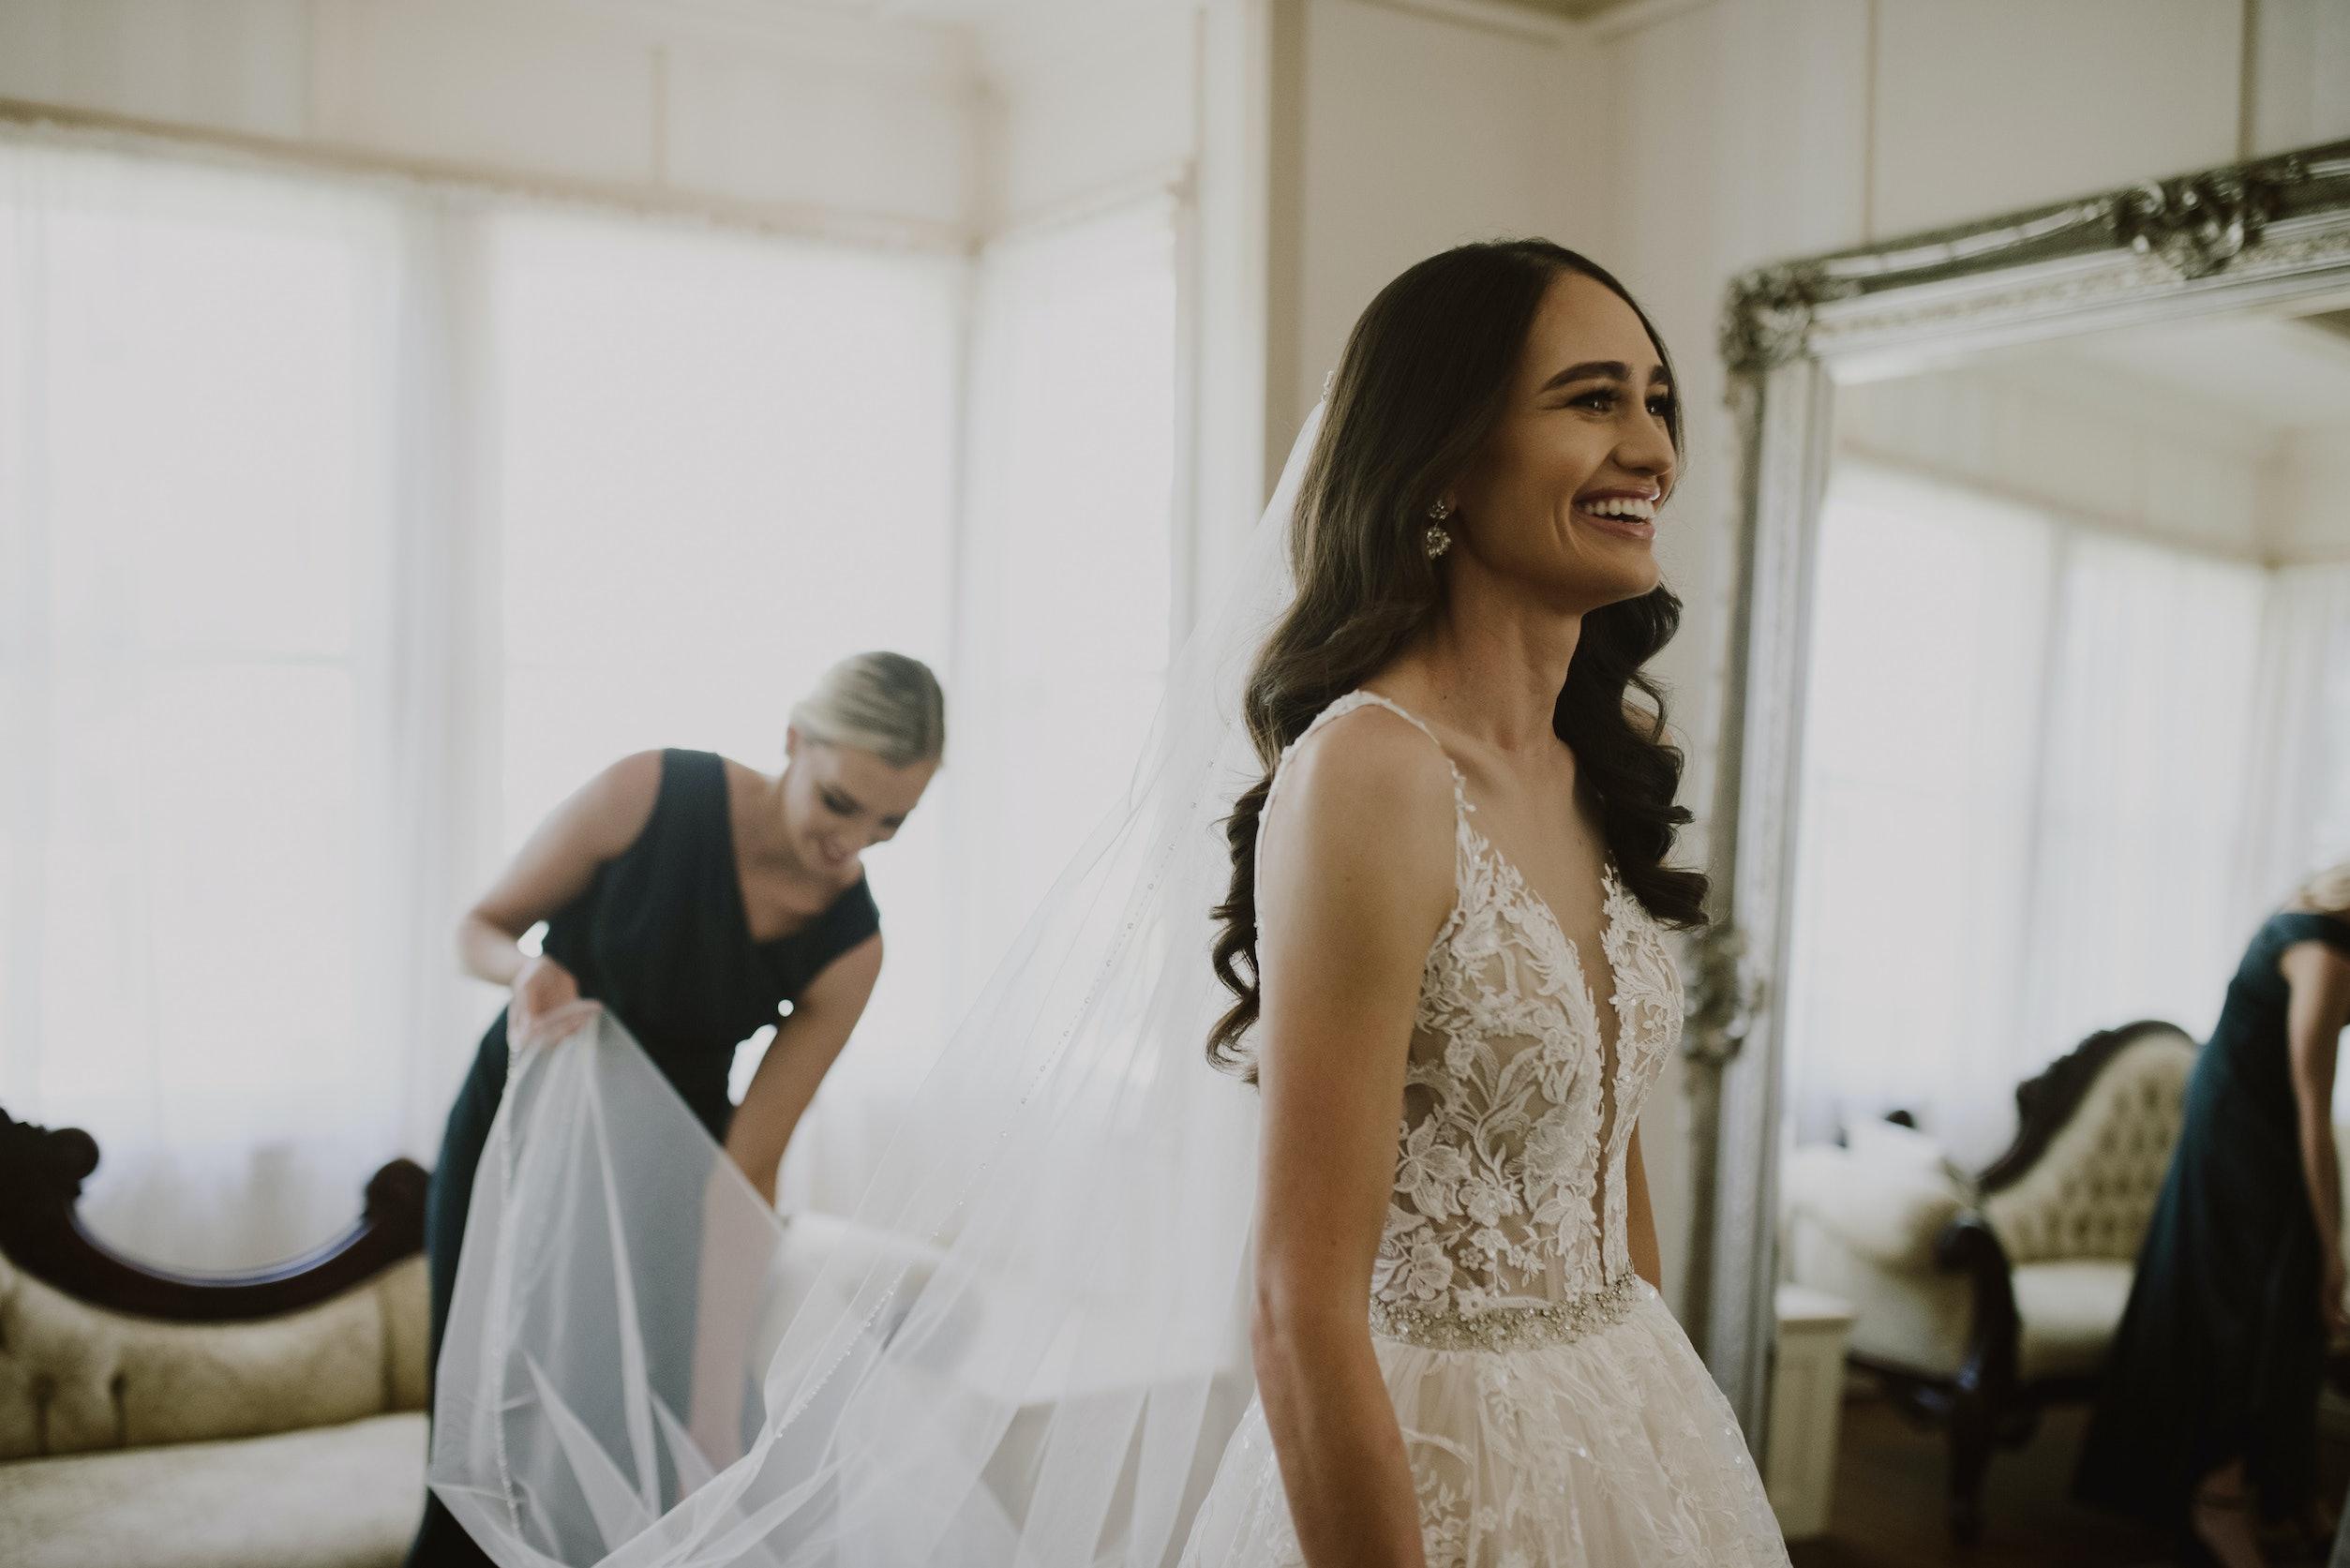 Bride laughing and bridesmaid holding brides veil